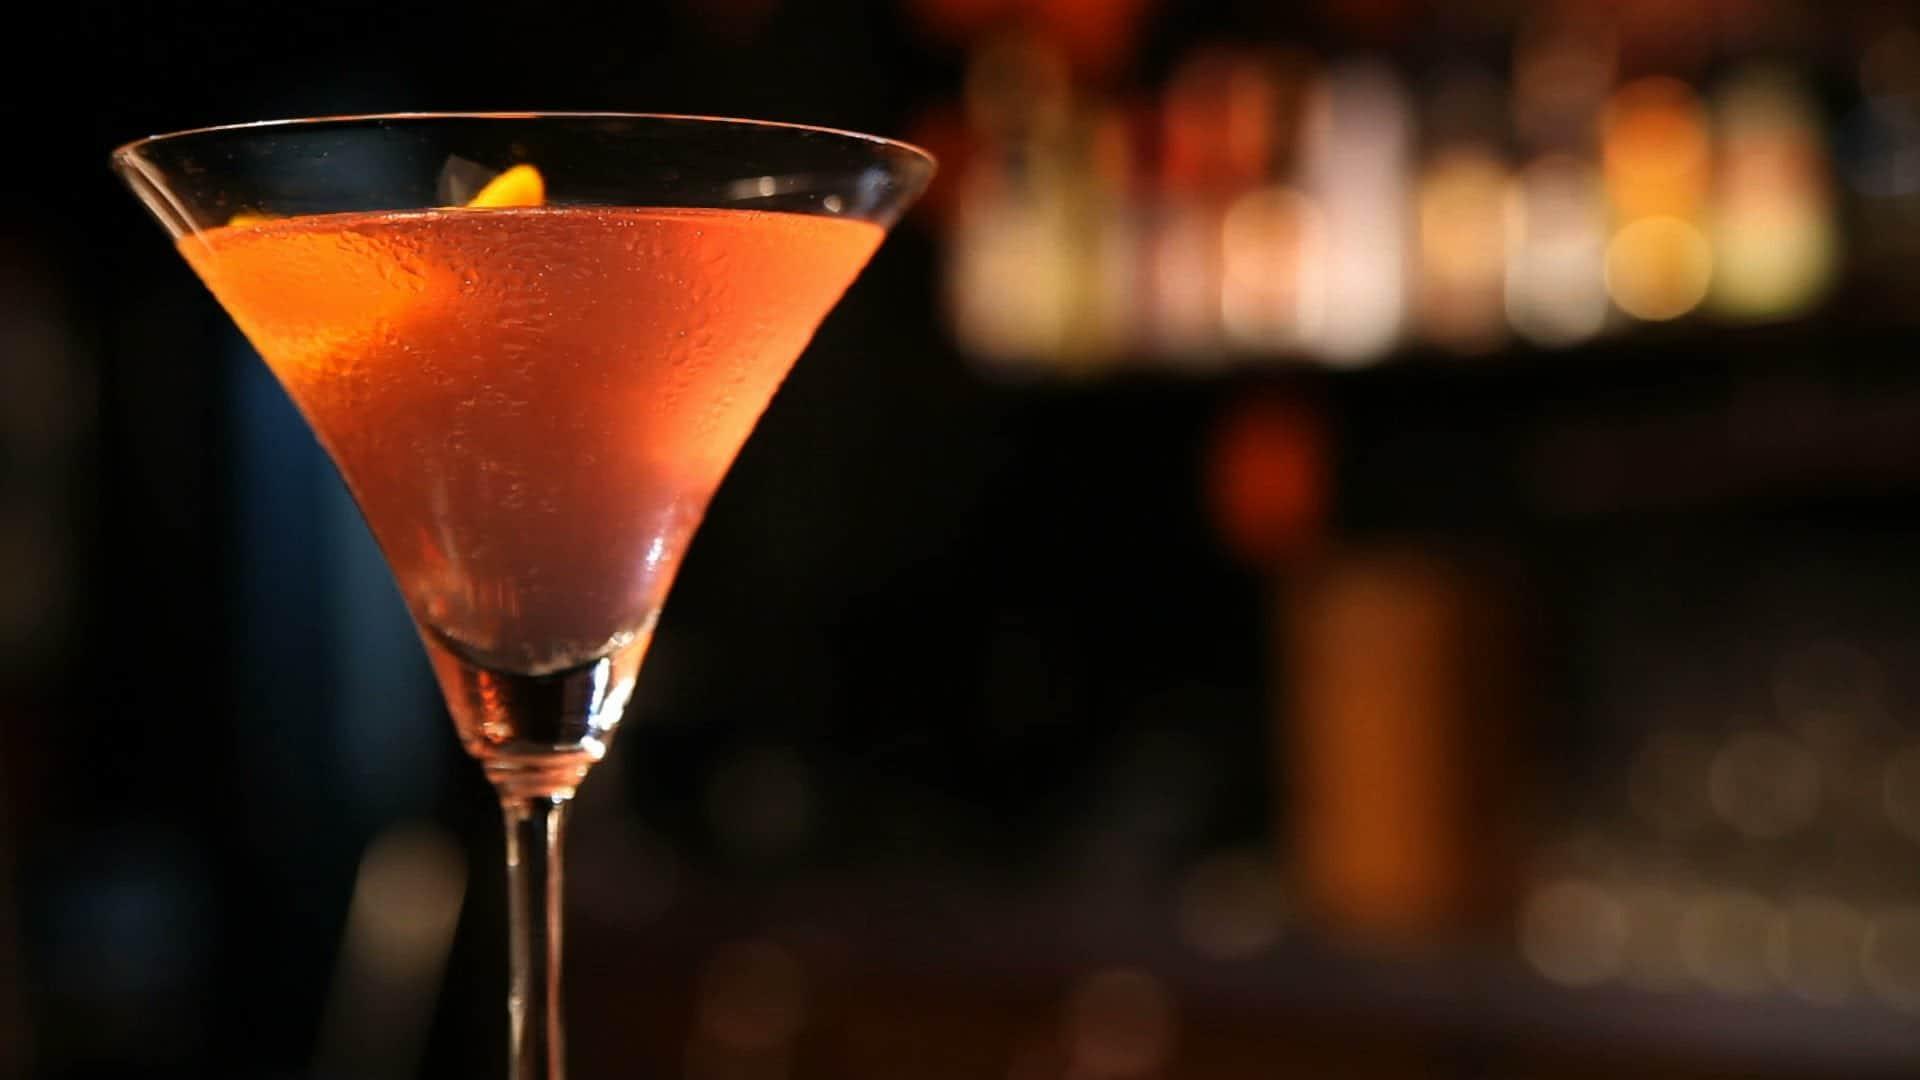 Cosmopolitan – girly drink